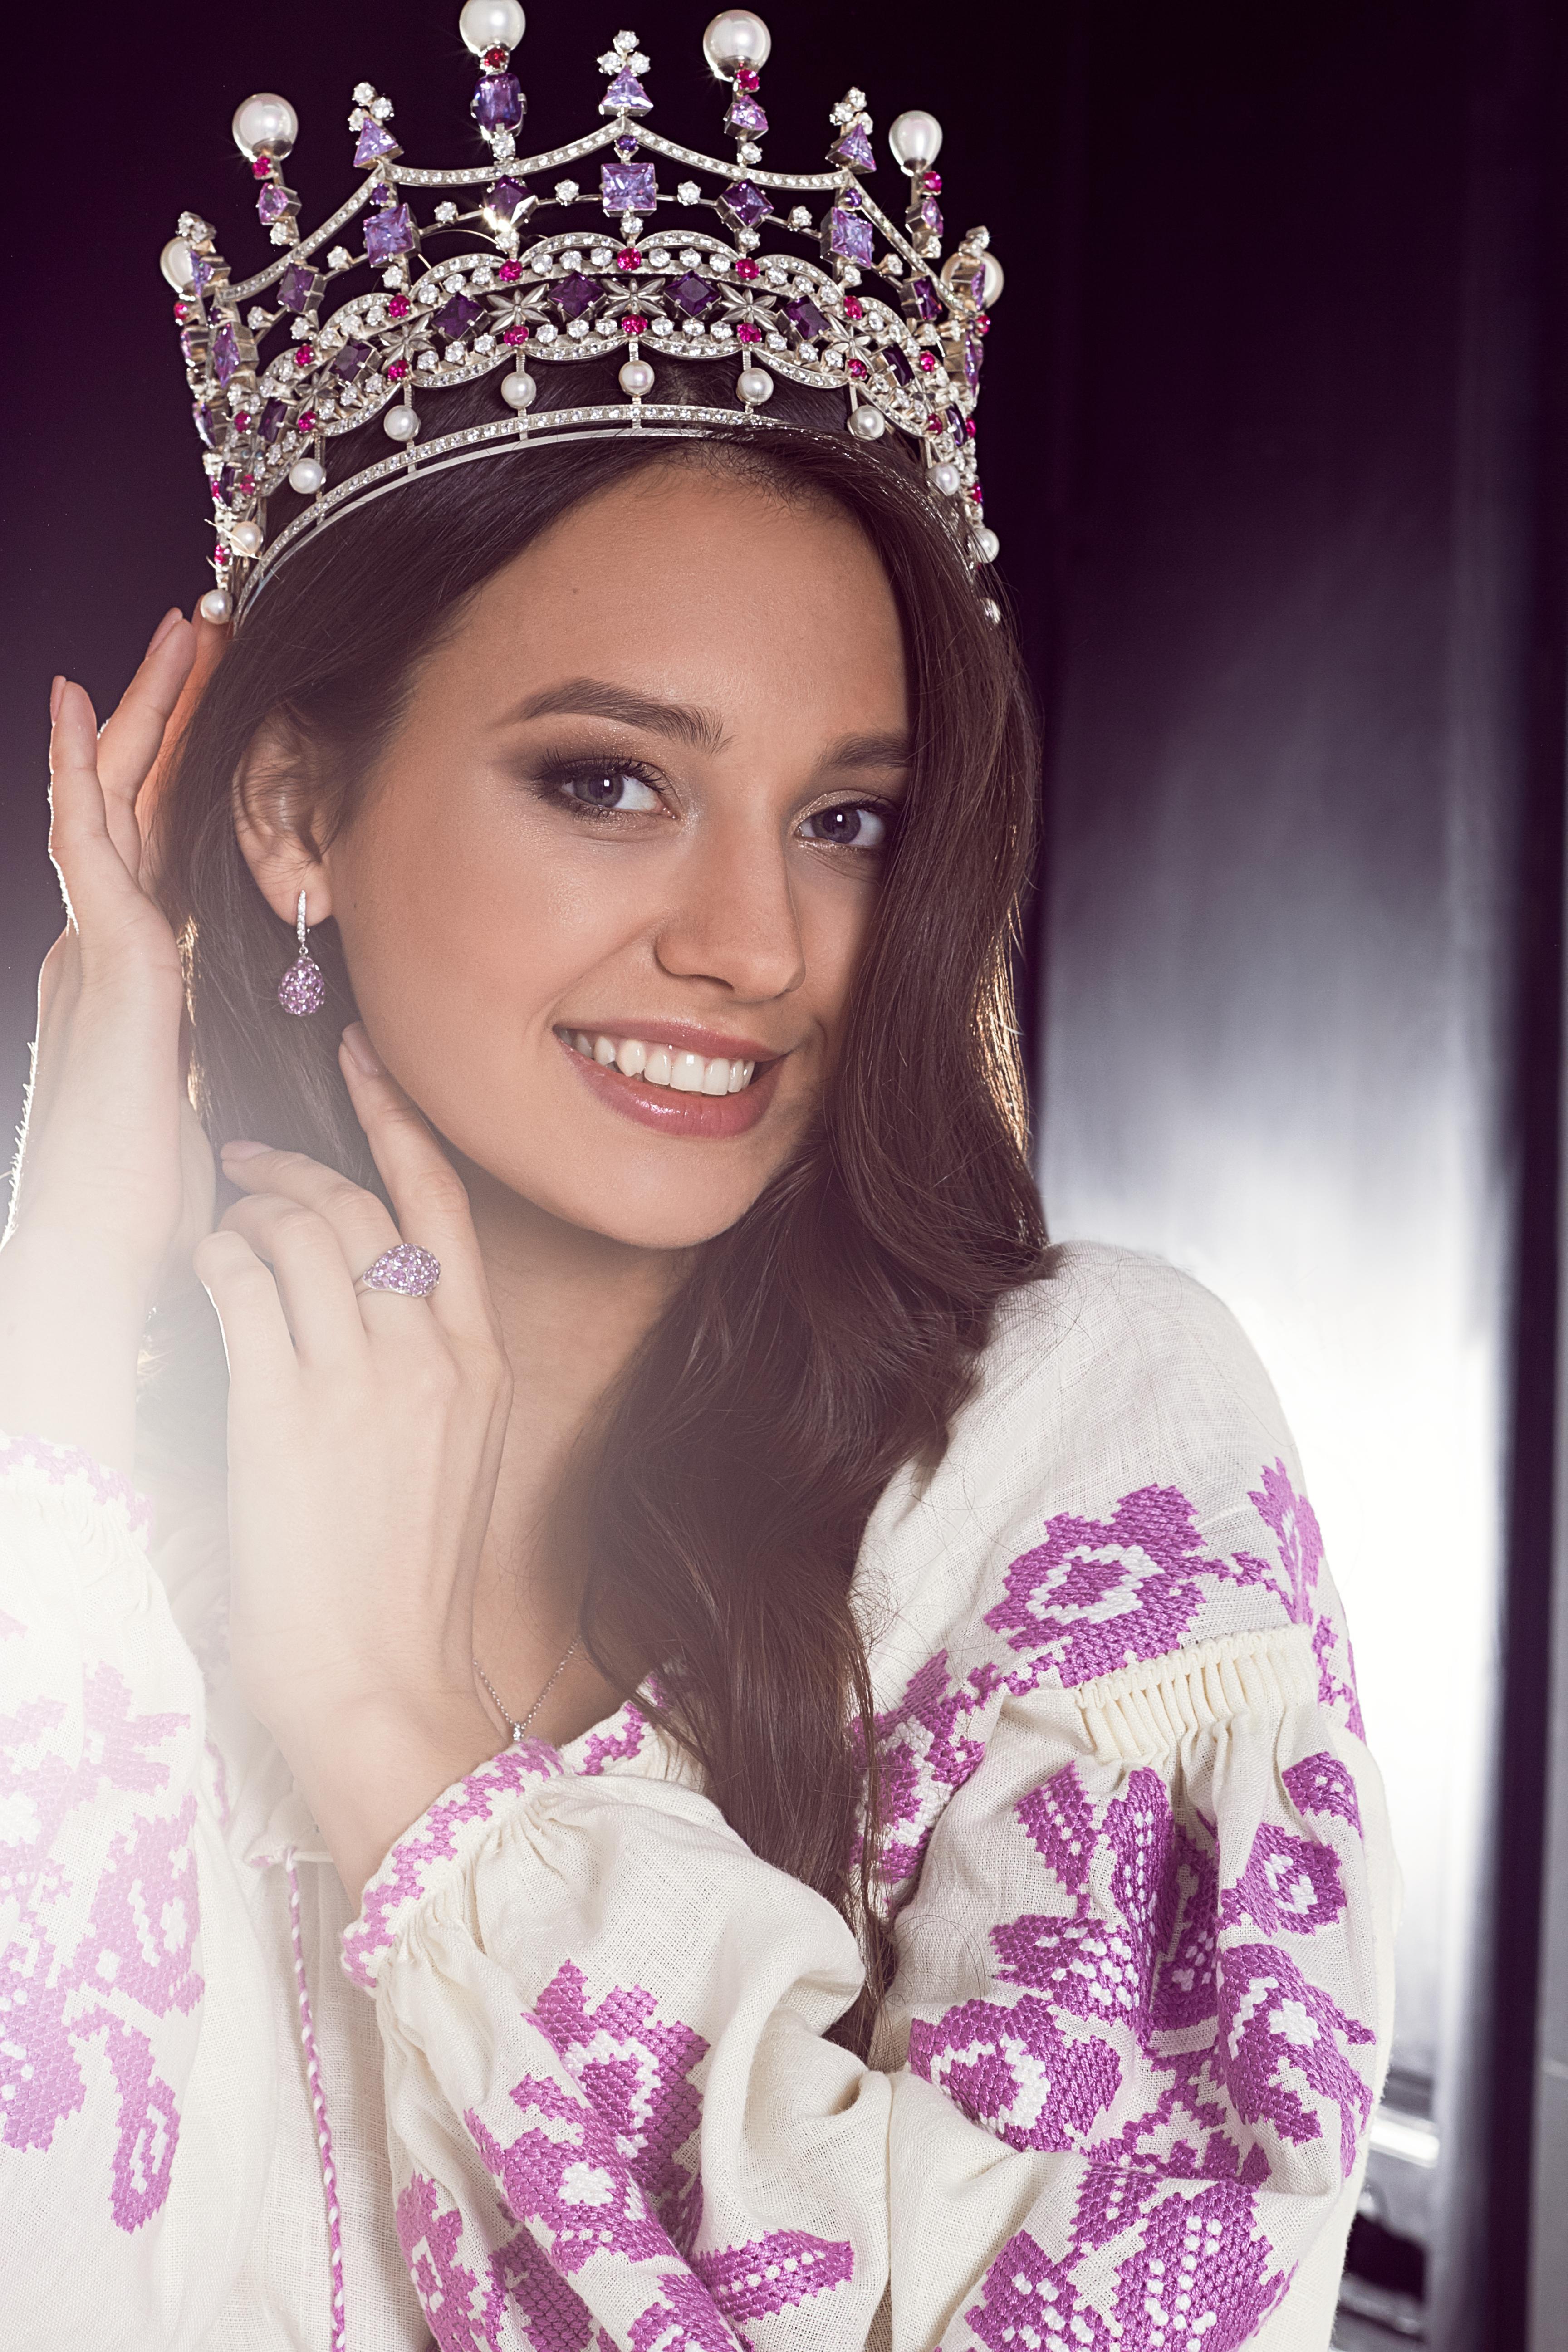 Ukrainian beauty: Polina Tkach, Miss Ukraine 2017 for FOBERINI